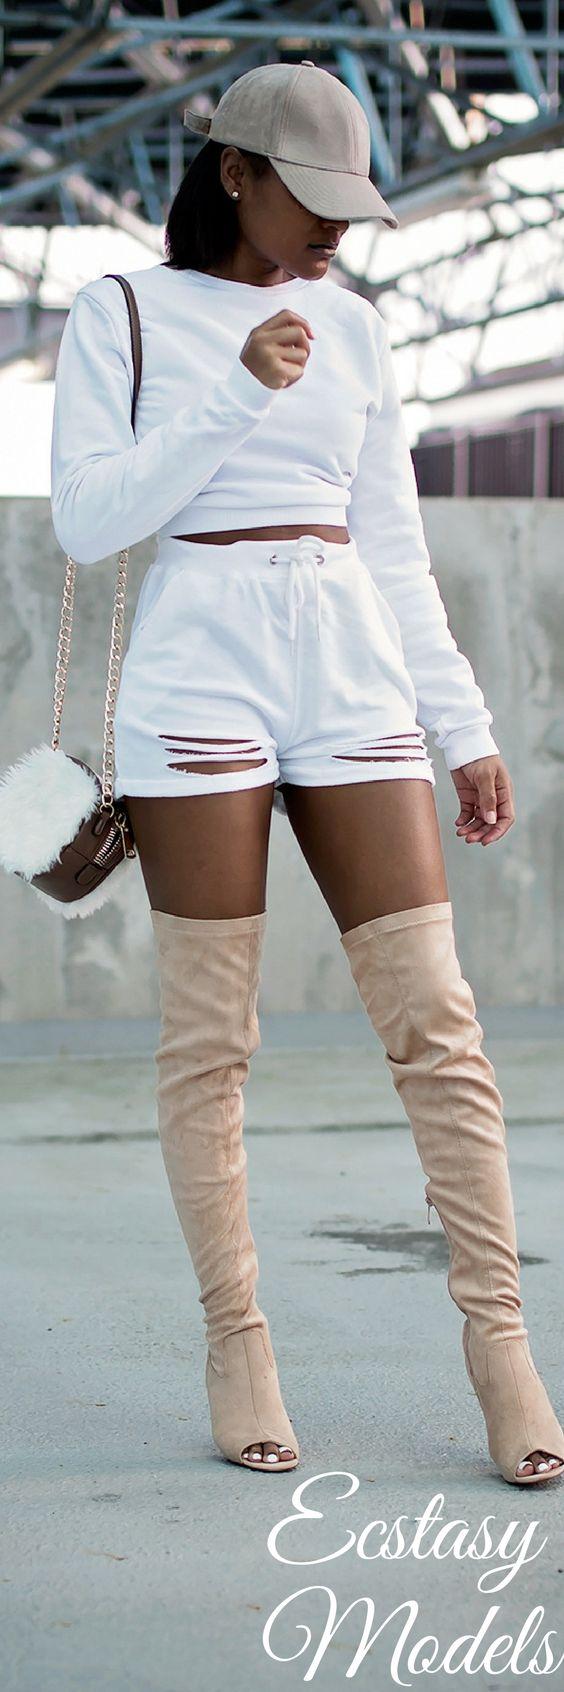 Sweatshirt Chic // Fashion Look by The Daileigh